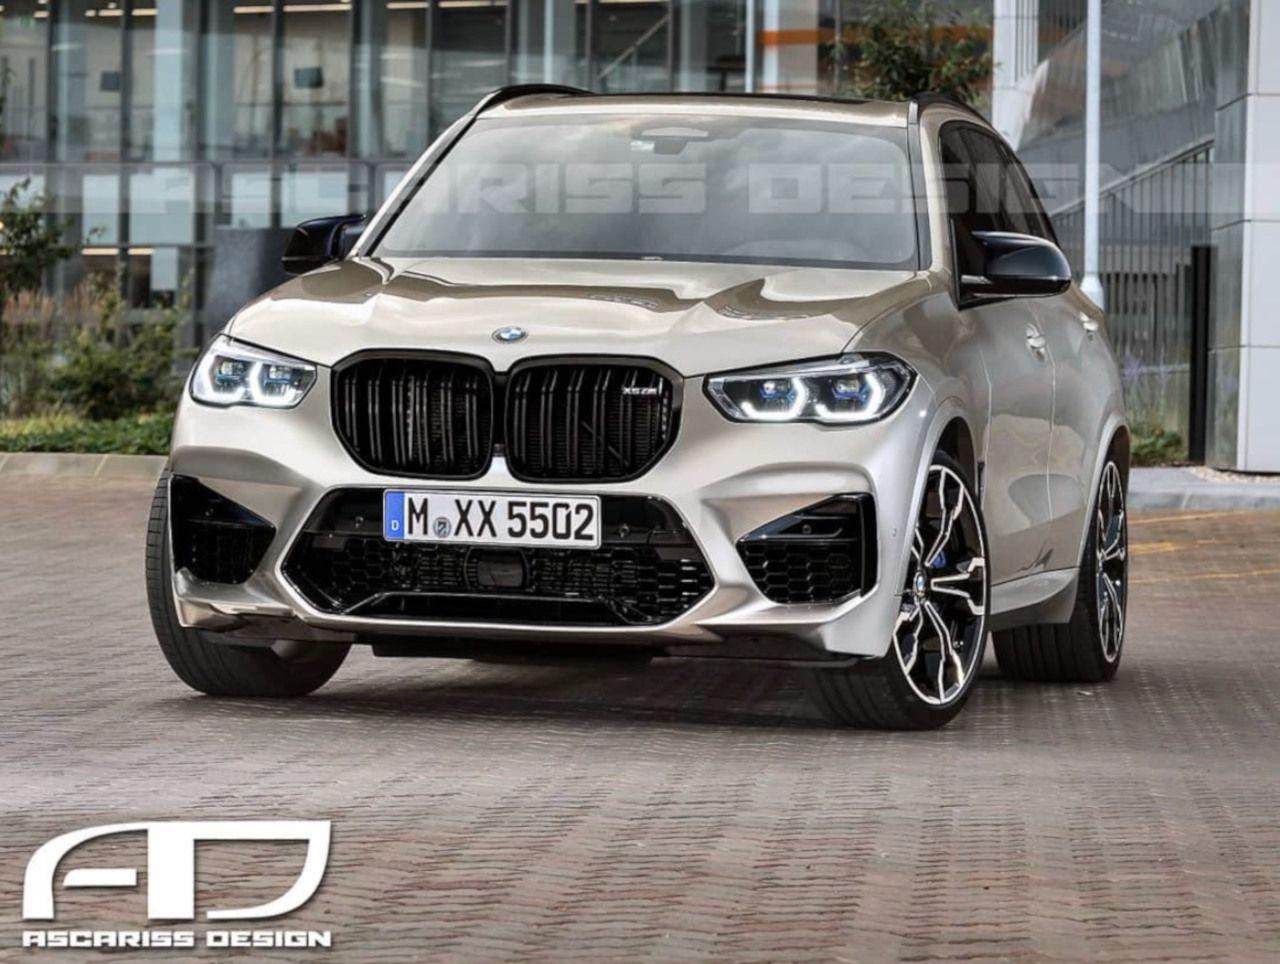 New rendering of the 2020 BMW X5 M Bmw x5 m, Bmw, Bmw x5